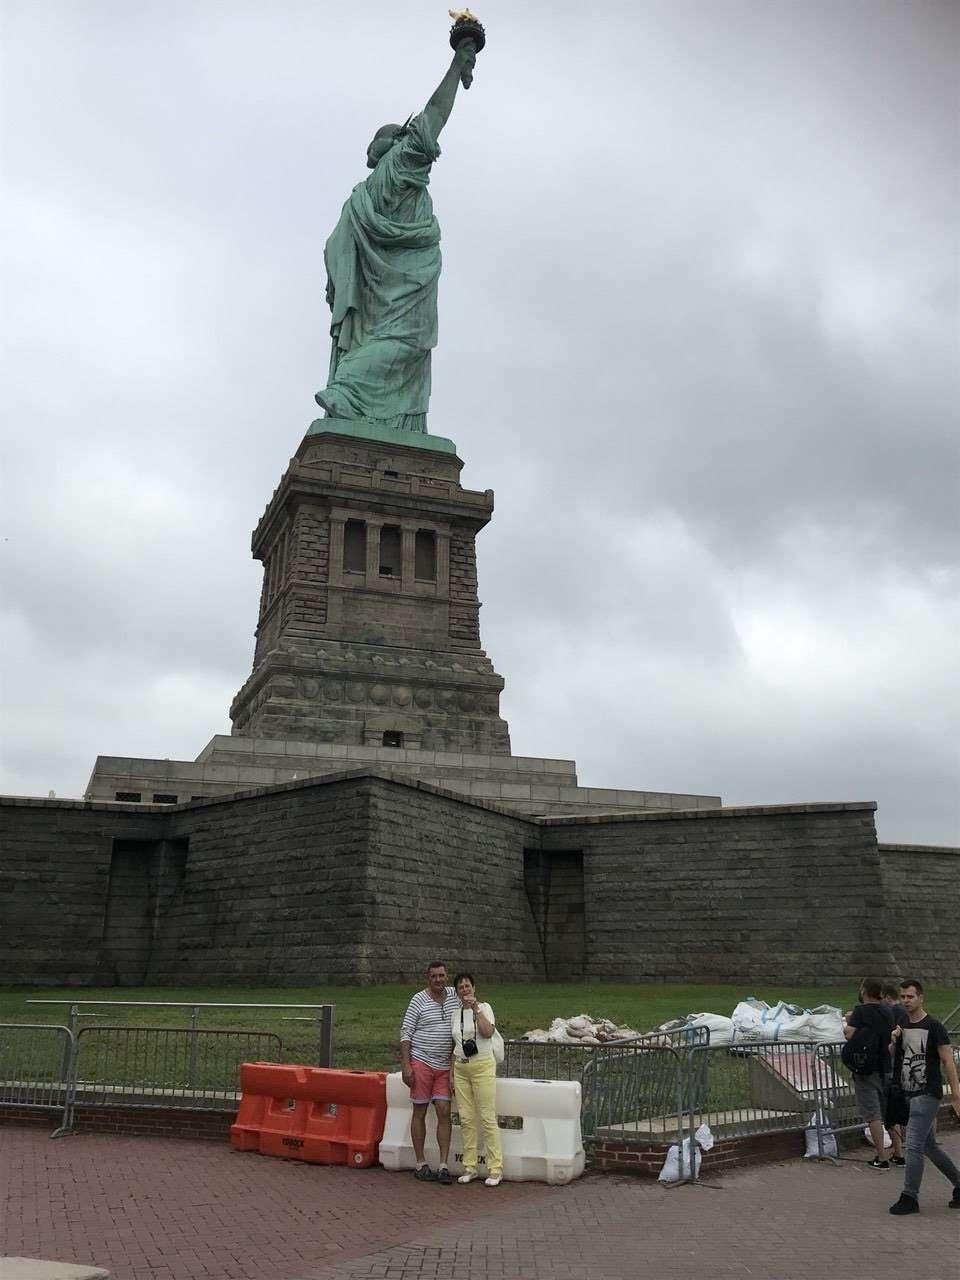 Liberty Harbor RV Park - rv park  | Photo 8 of 10 | Address: 11 Marin Blvd, Jersey City, NJ 07302, USA | Phone: (201) 516-7500